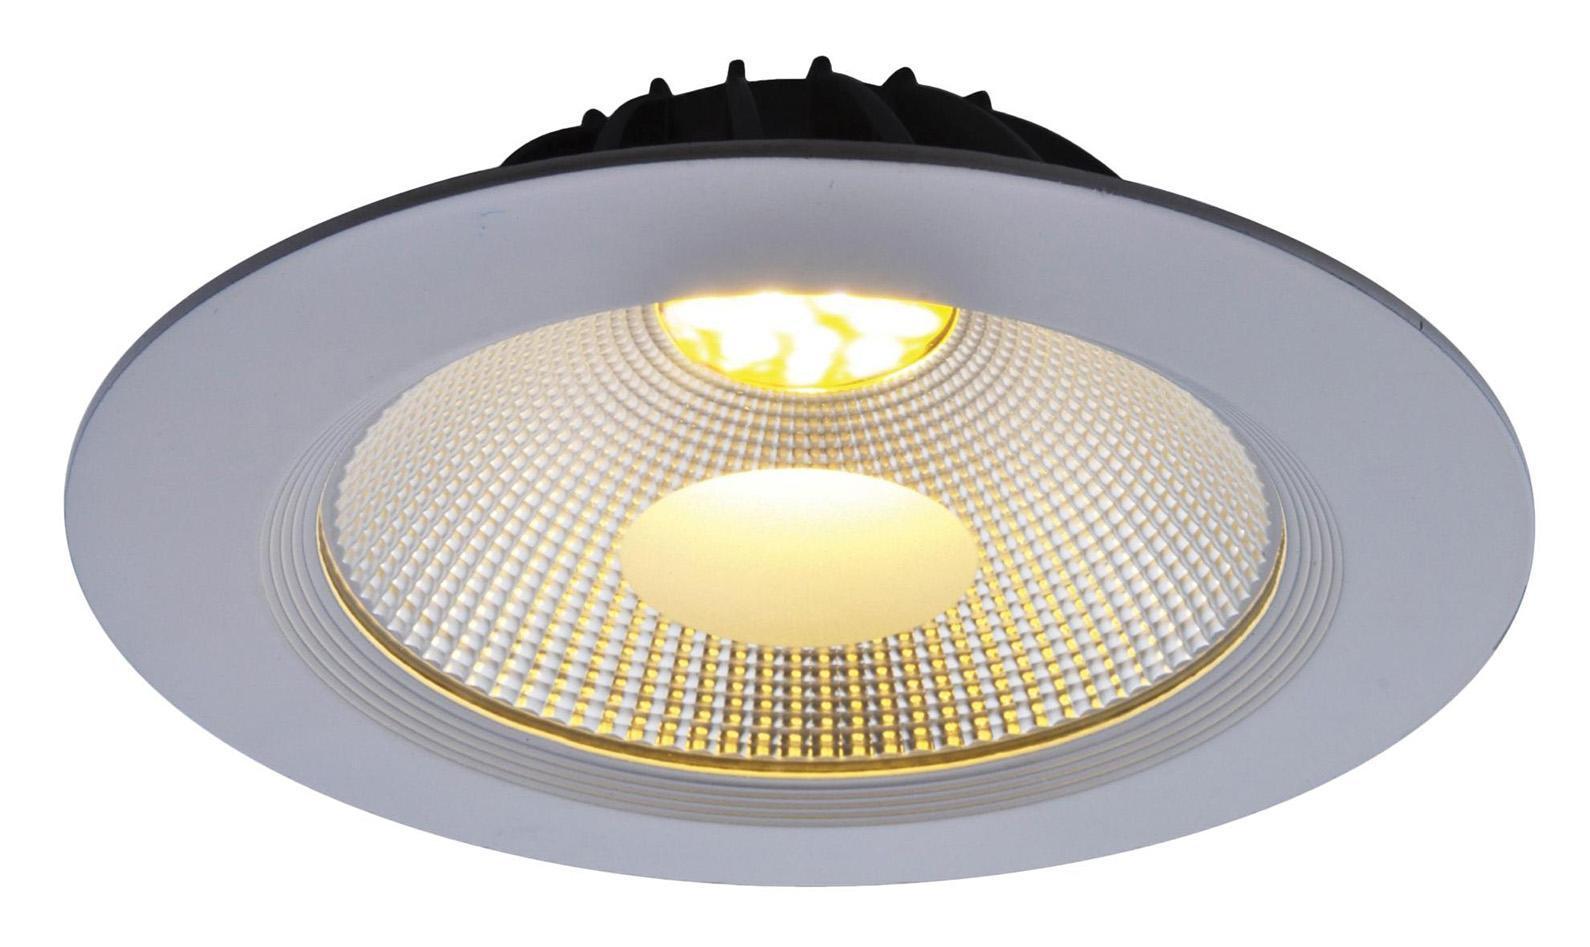 A2415PL-1WH UOVO Встраиваемый светильникA2415PL-1WH15W LED; 1200 lm